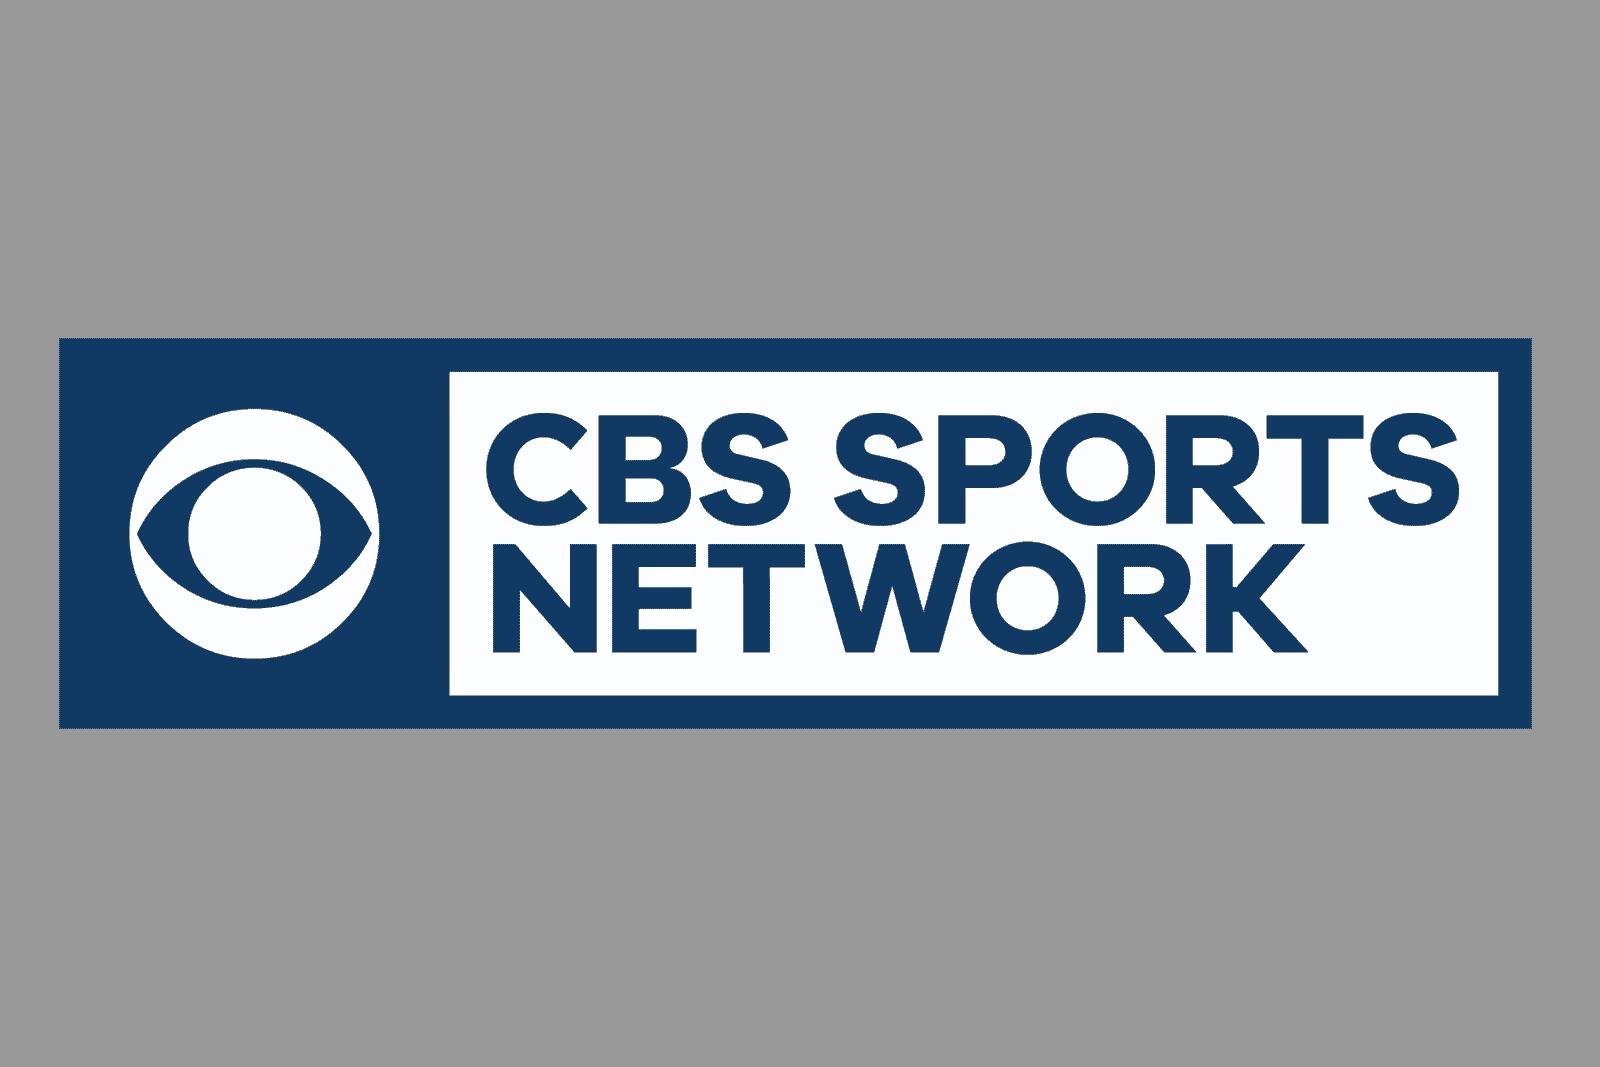 2020 CBS Sports Network college football schedule